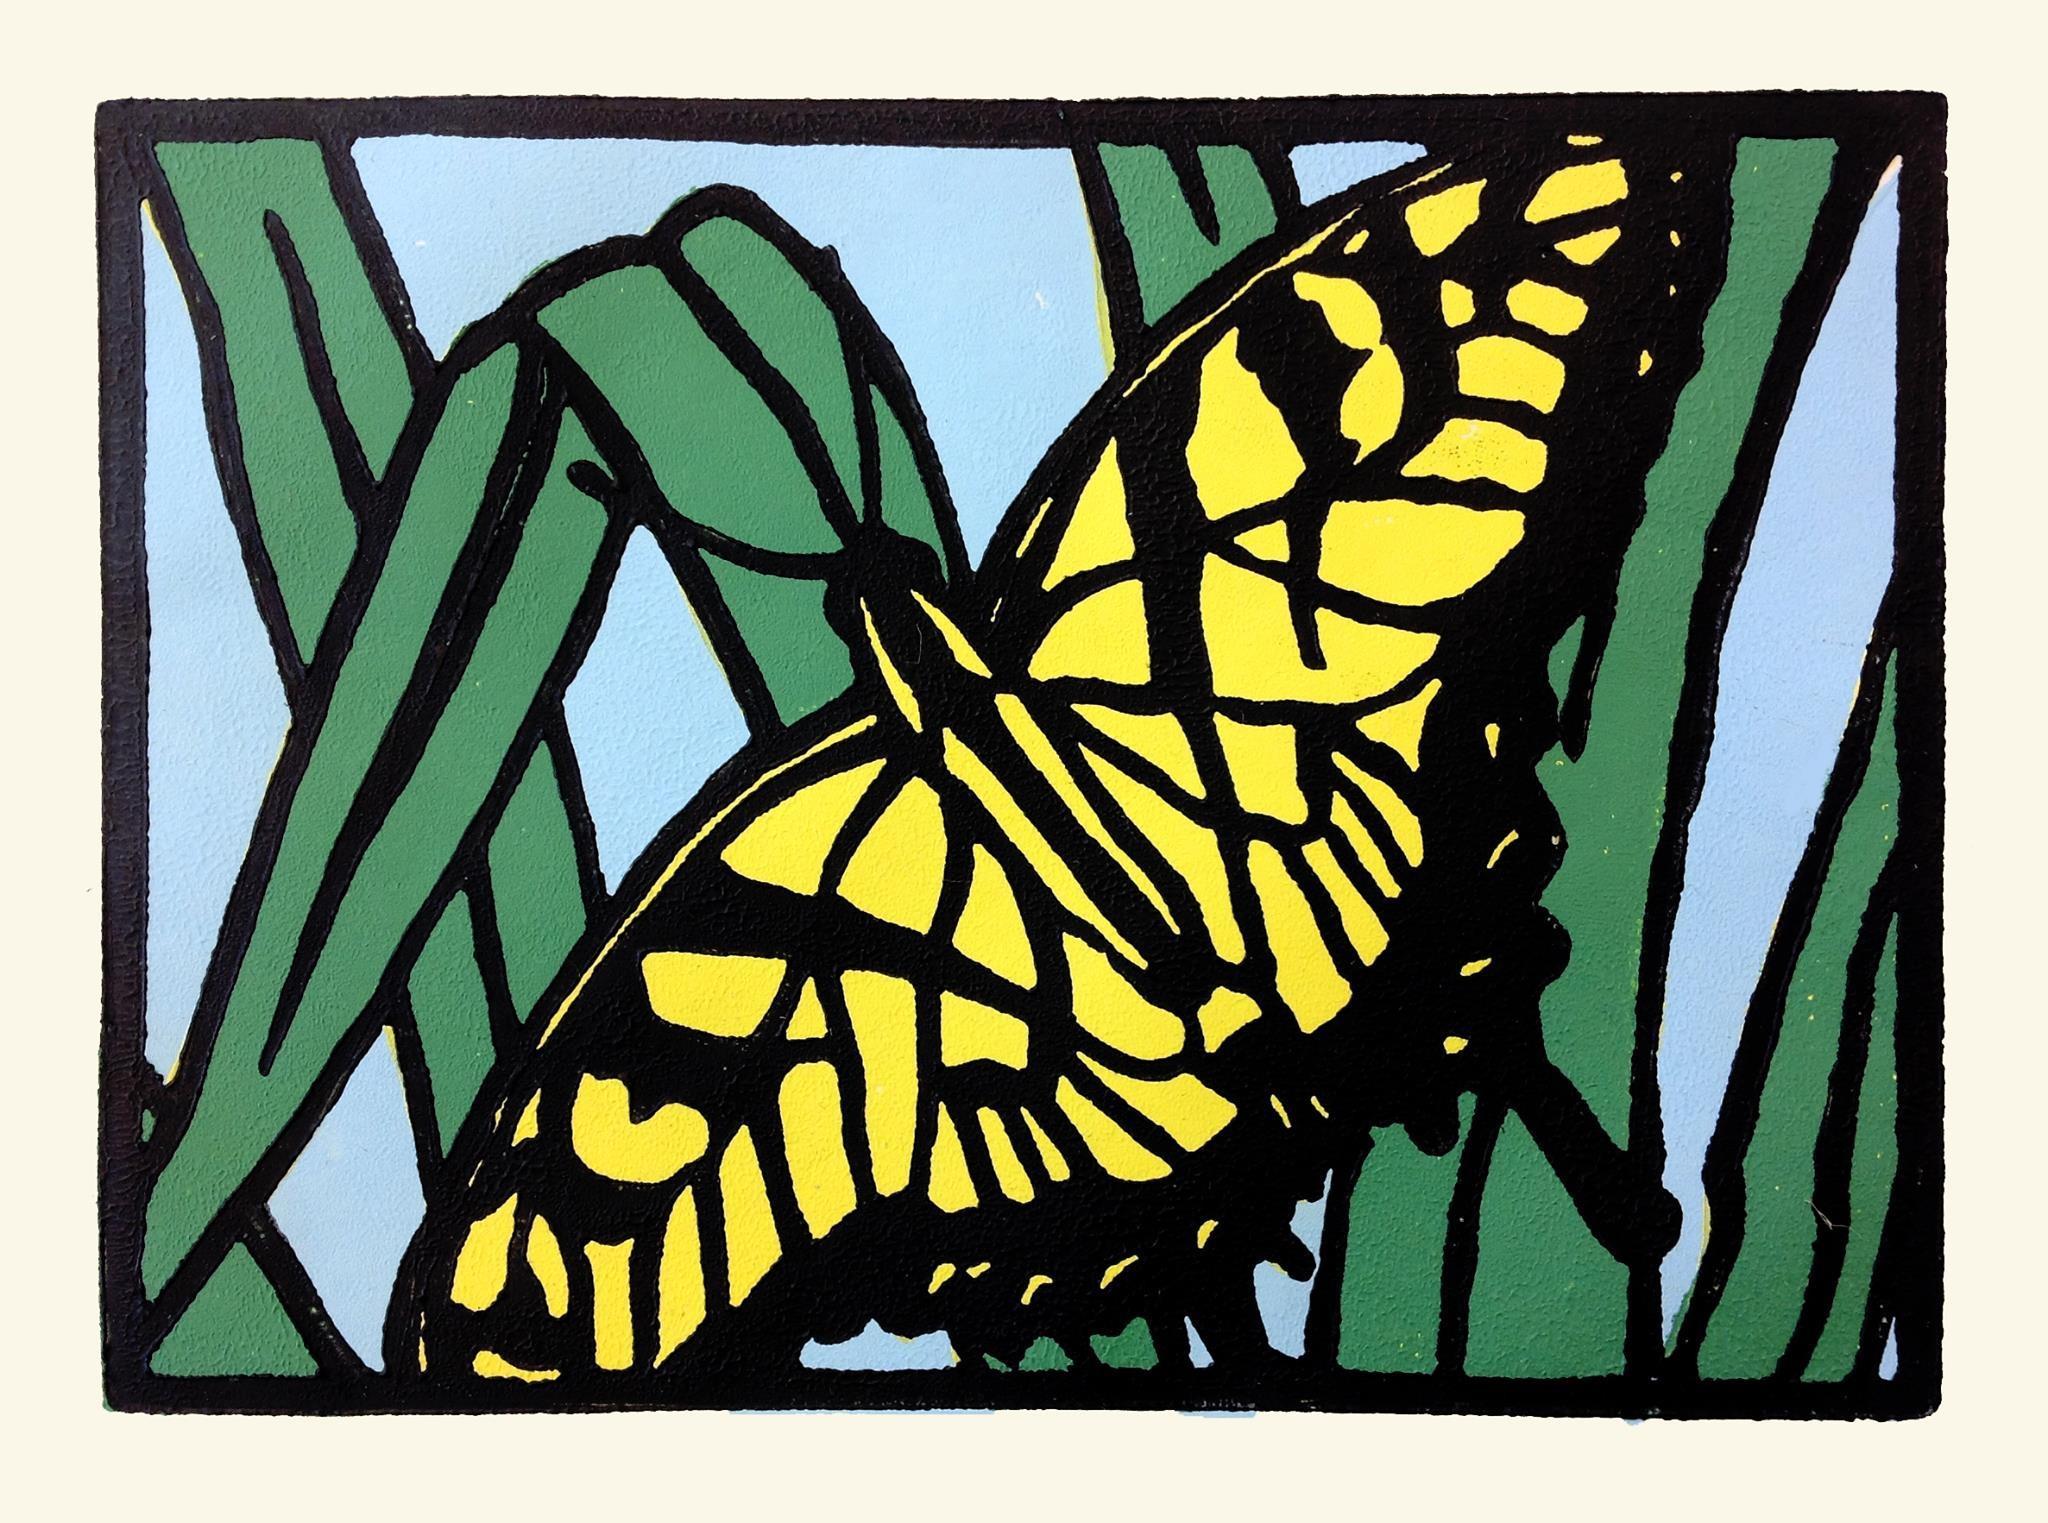 "Papilio glaucus  , 2013. Linoleum Block print, 5 x 7"", open edition. Available for purchase."